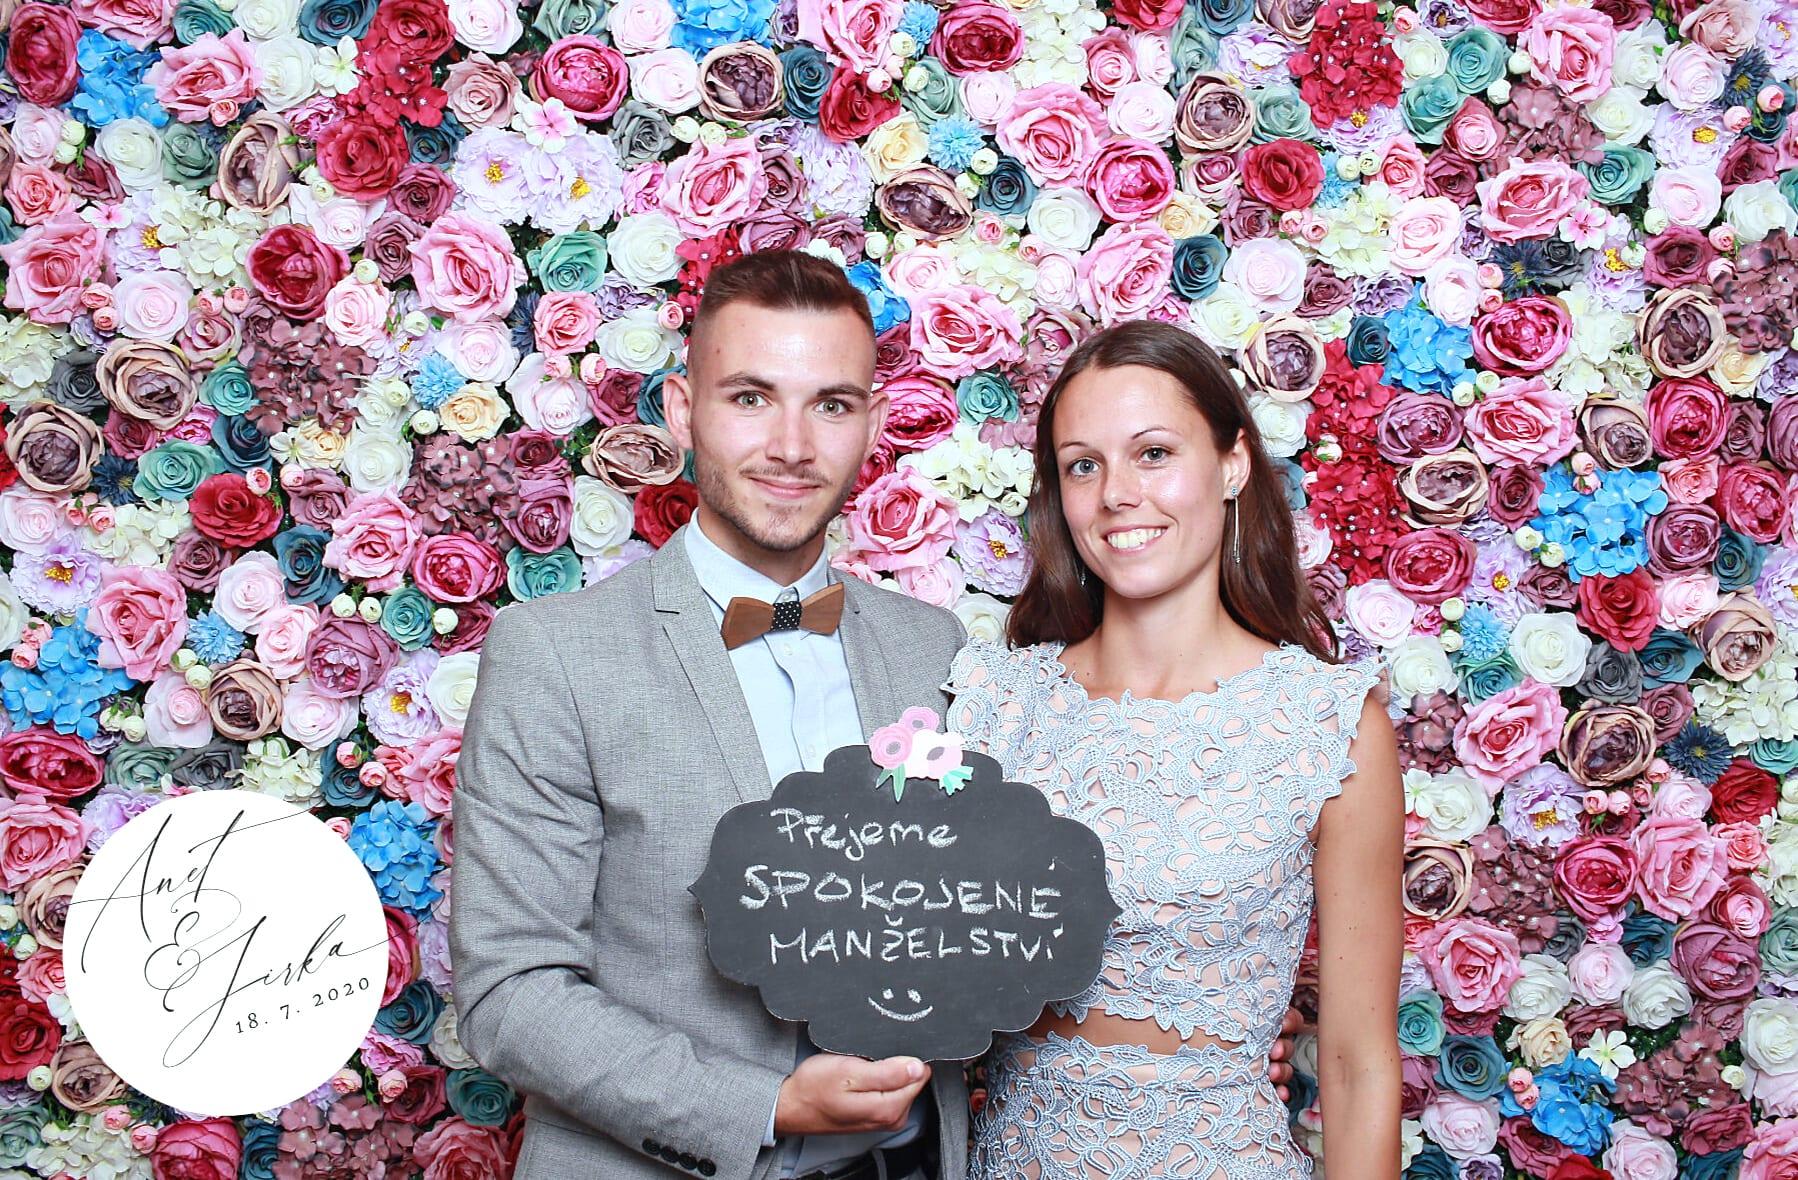 fotokoutek-ceske-budejovice-svatba-anet-jirka-18-7-2020-725682